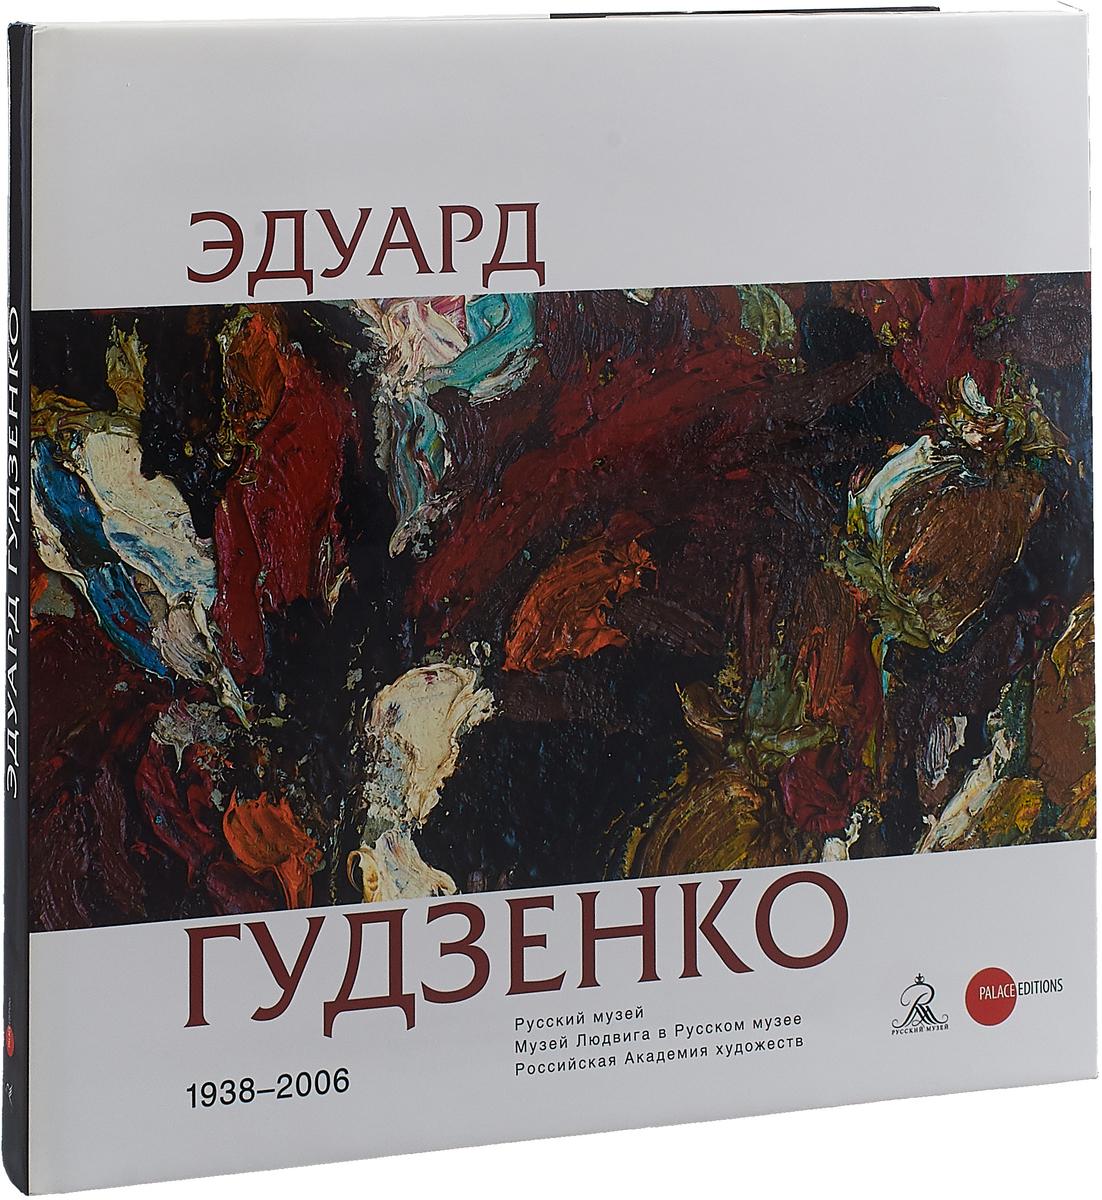 Эдуард Гудзенко. 1938 - 2006